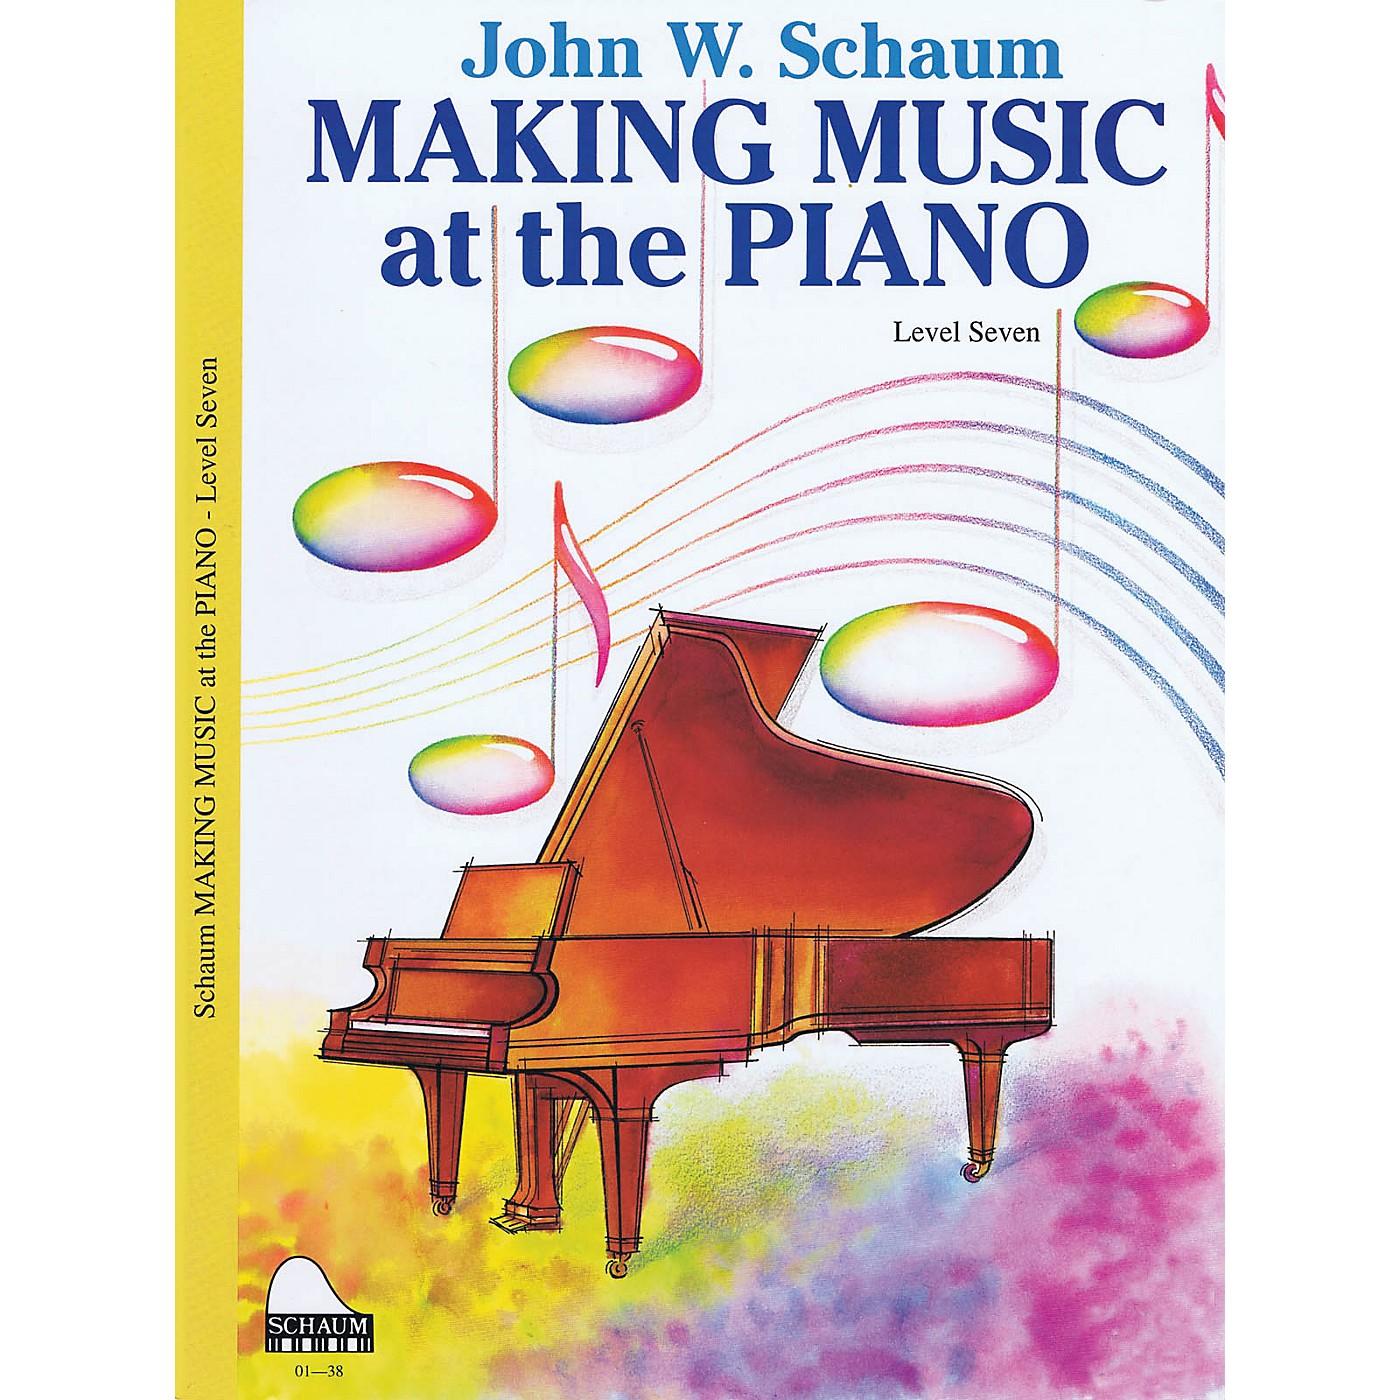 SCHAUM Making Music Method (Level 7 Advanced Level) Educational Piano Book by John W. Schaum thumbnail